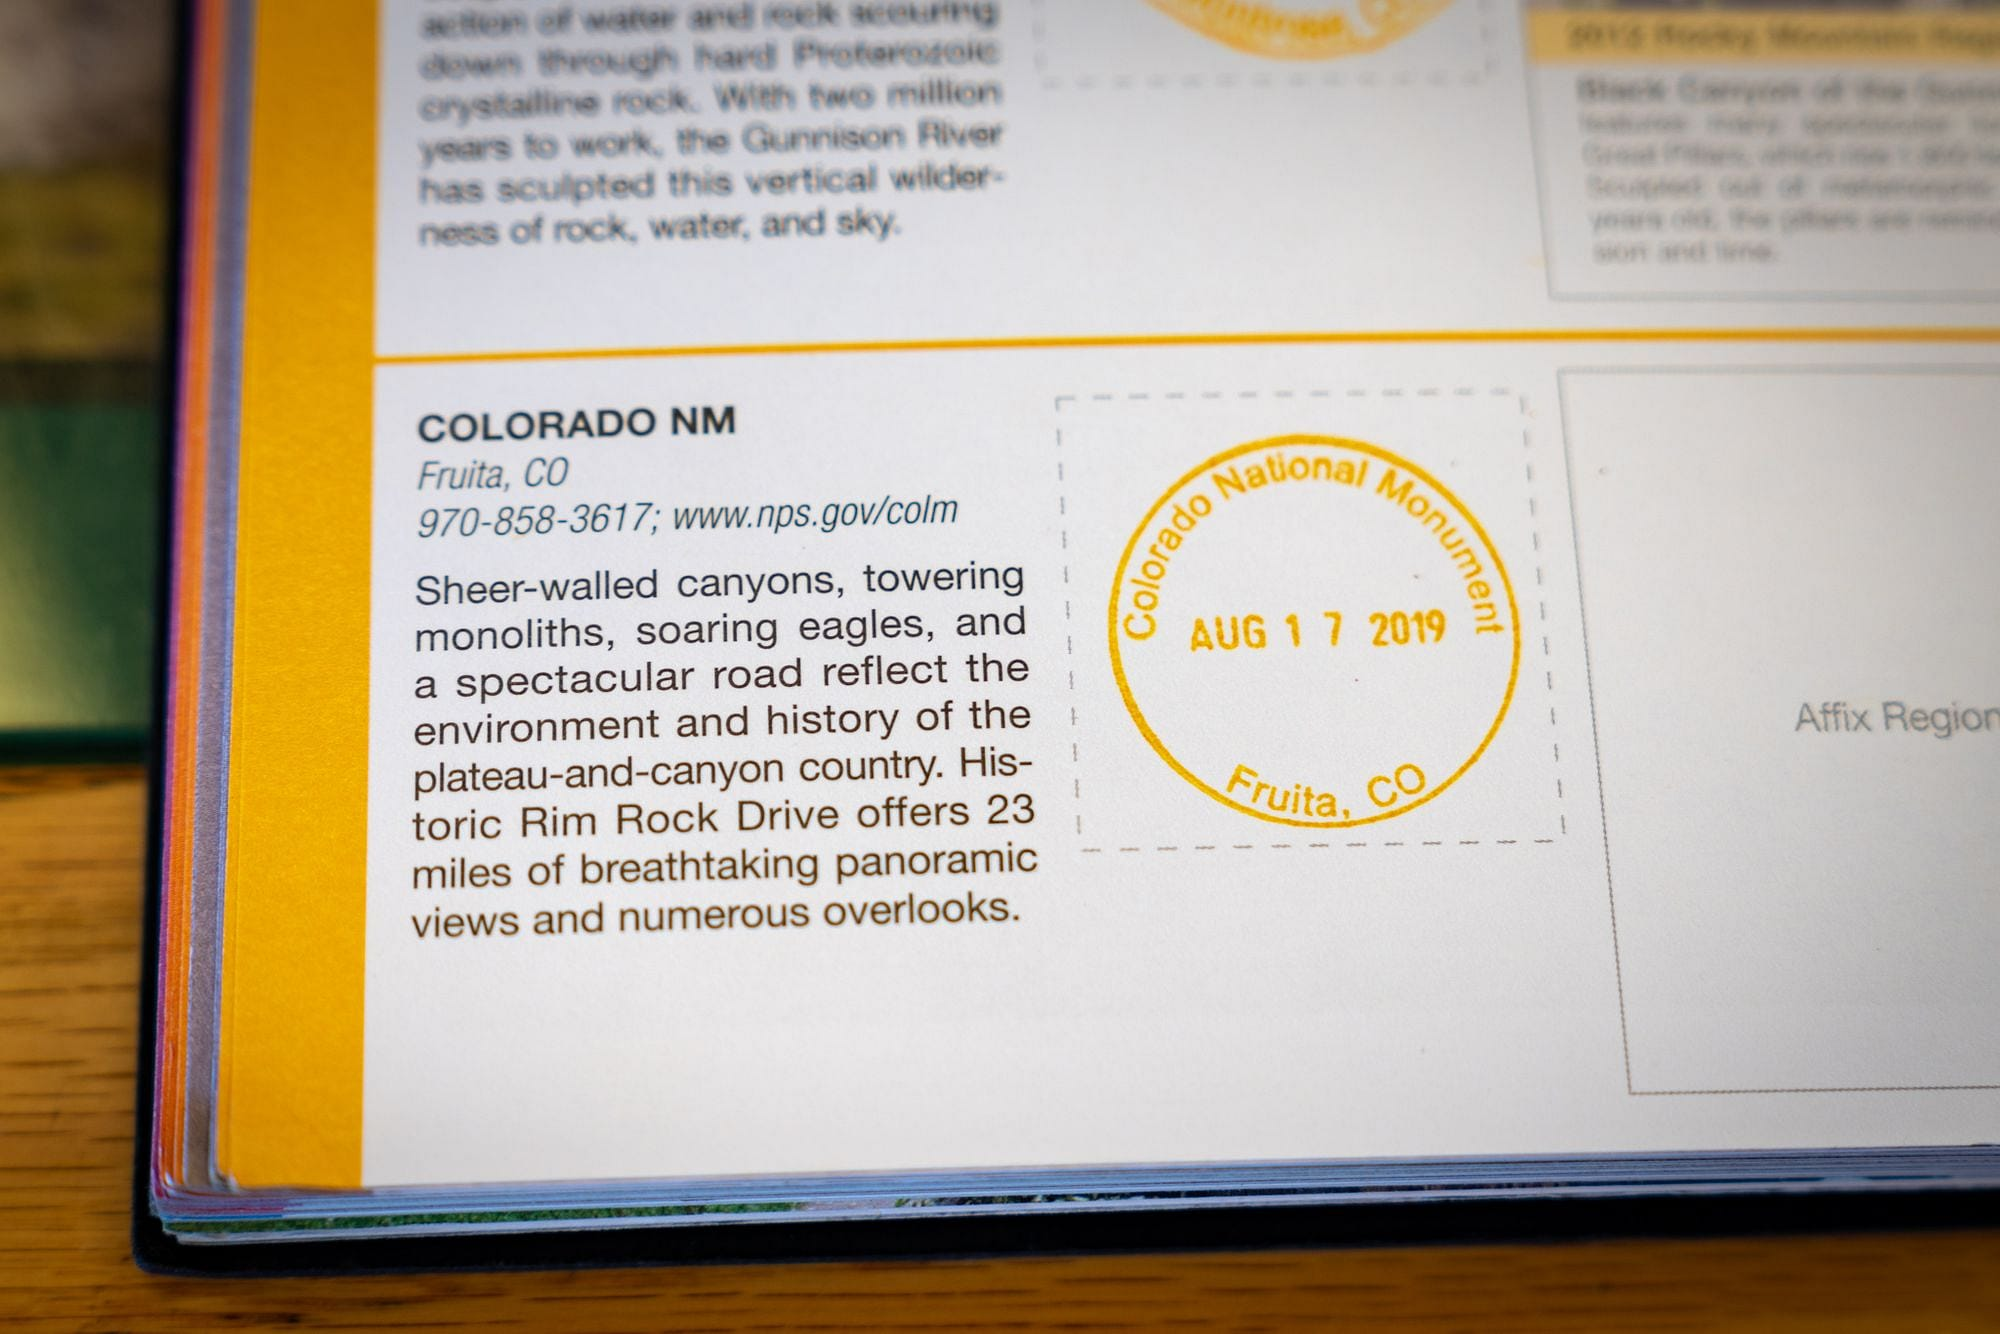 Colorado National Monument Passport Stamp